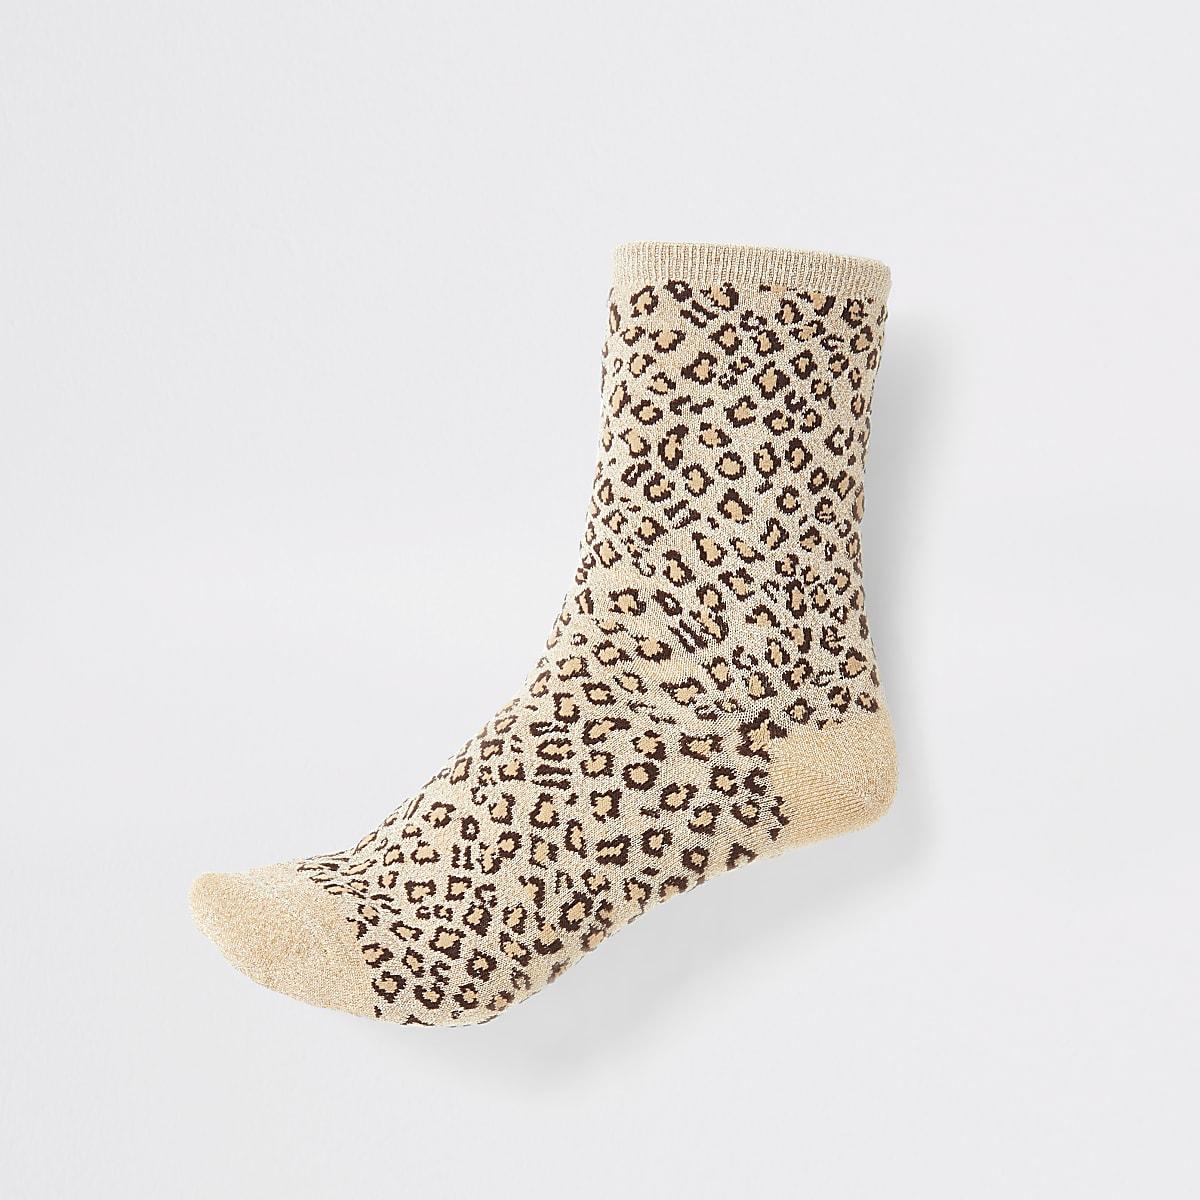 Bruine enkelsokken met glitter luipaardprint